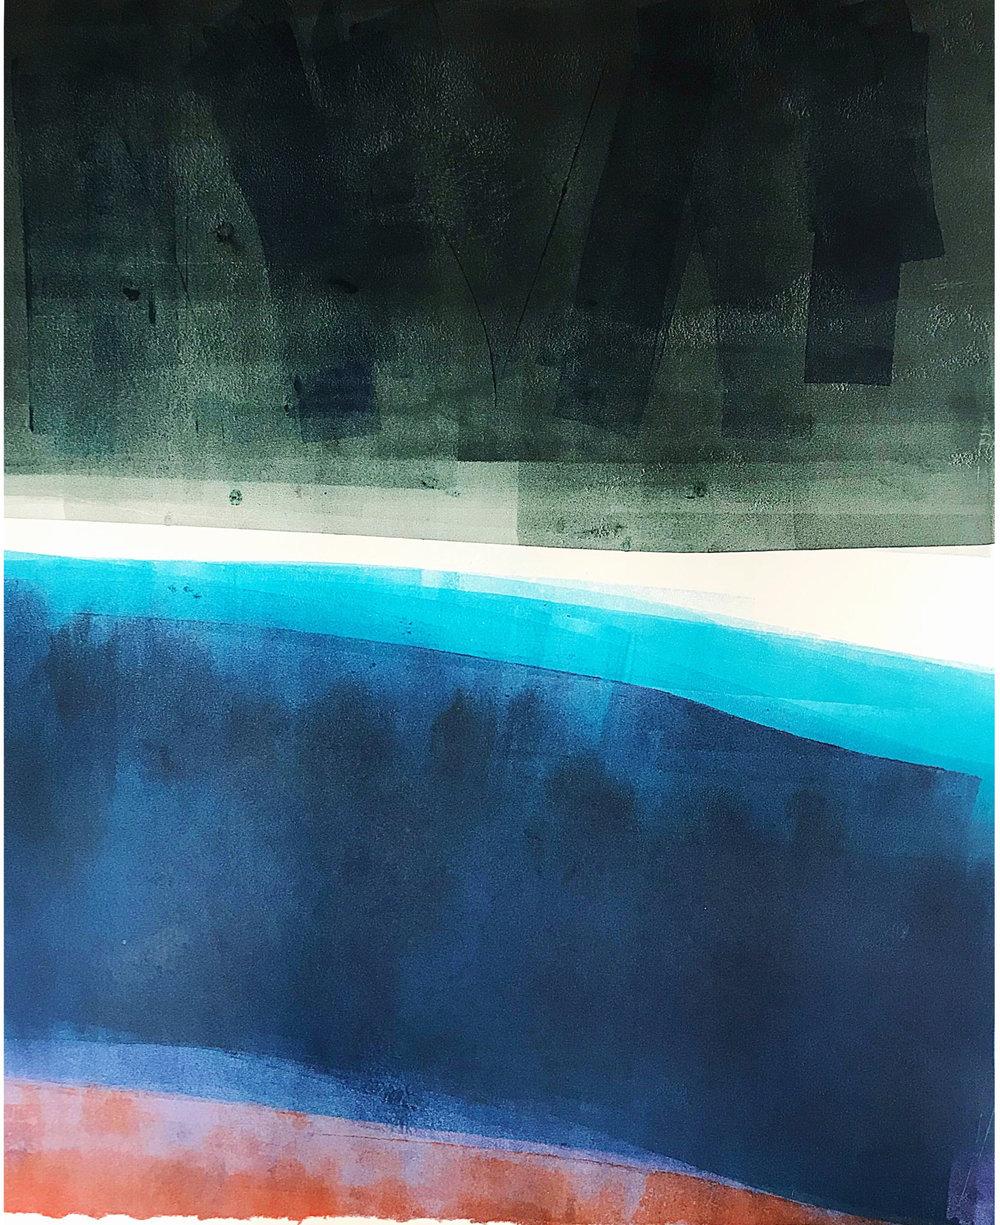 painting25_Monoprint+22x30+$450.JPG